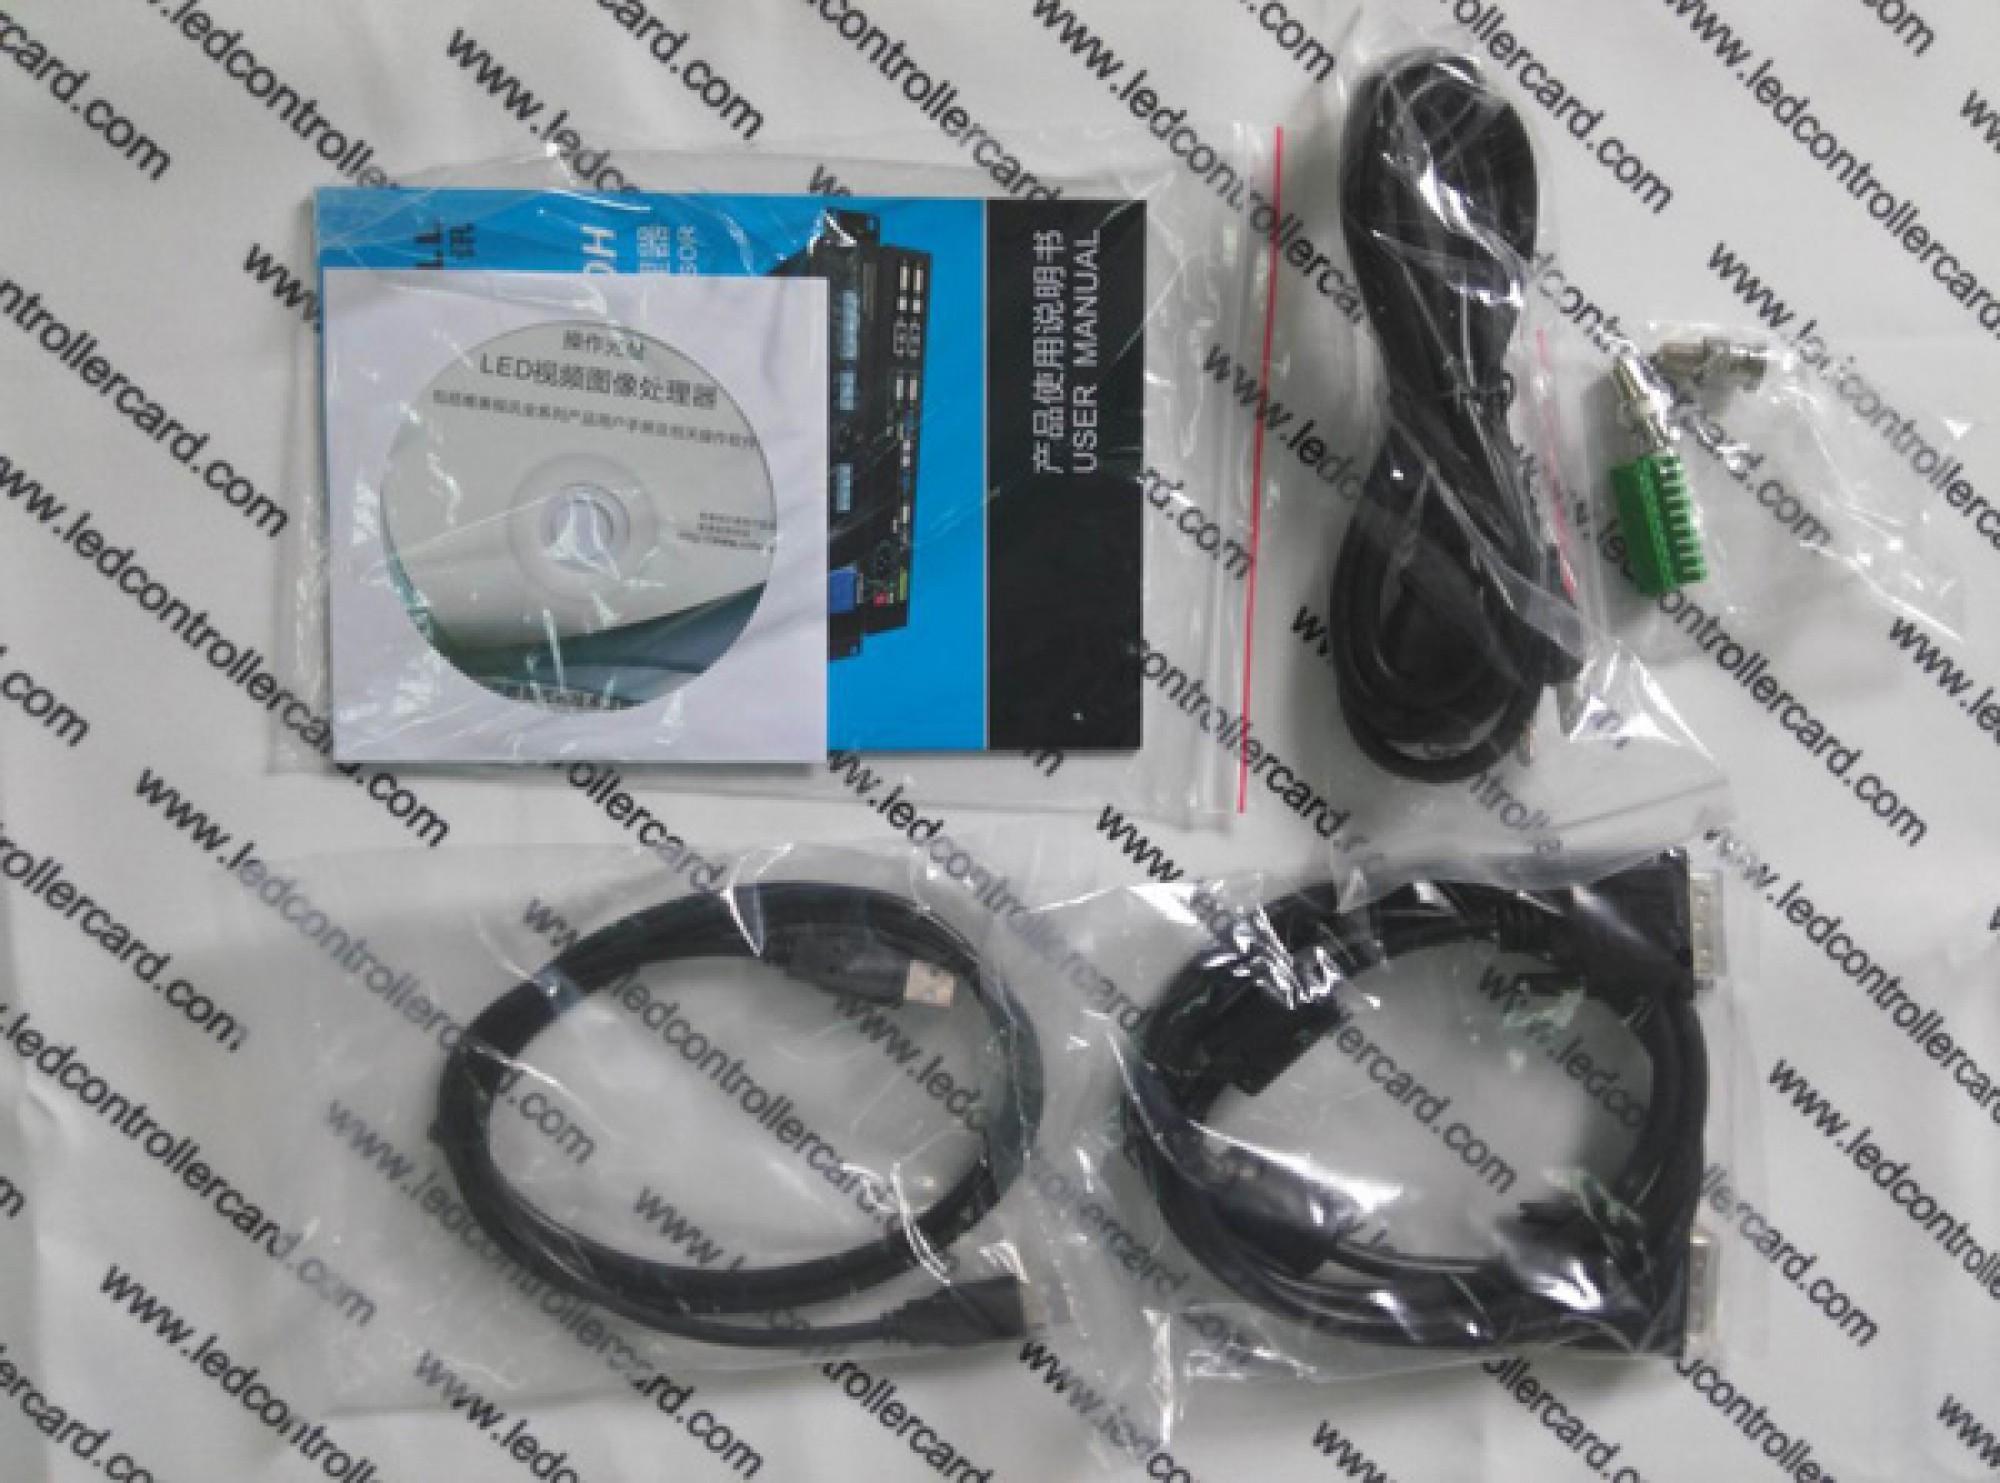 VDWALL LEDSync820H LED Video Switcher